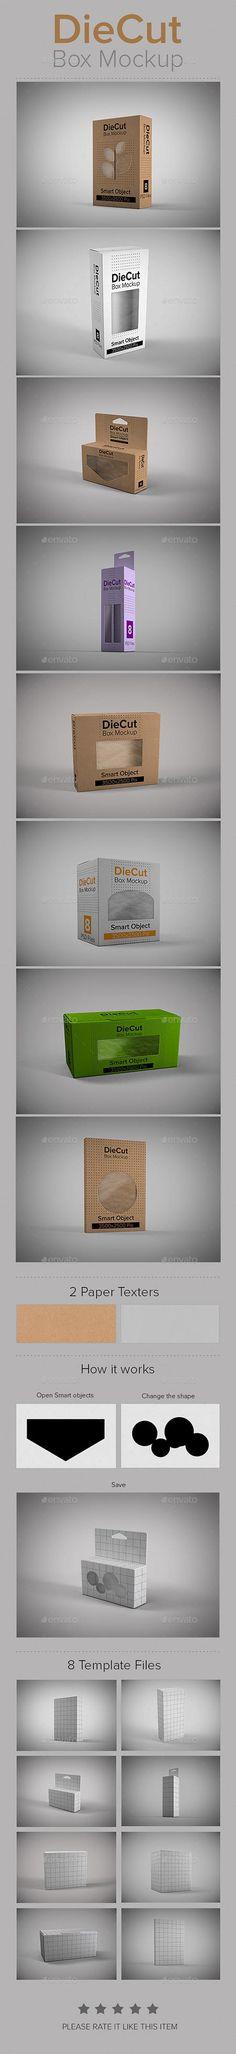 DieCut Box Mockup 9083428